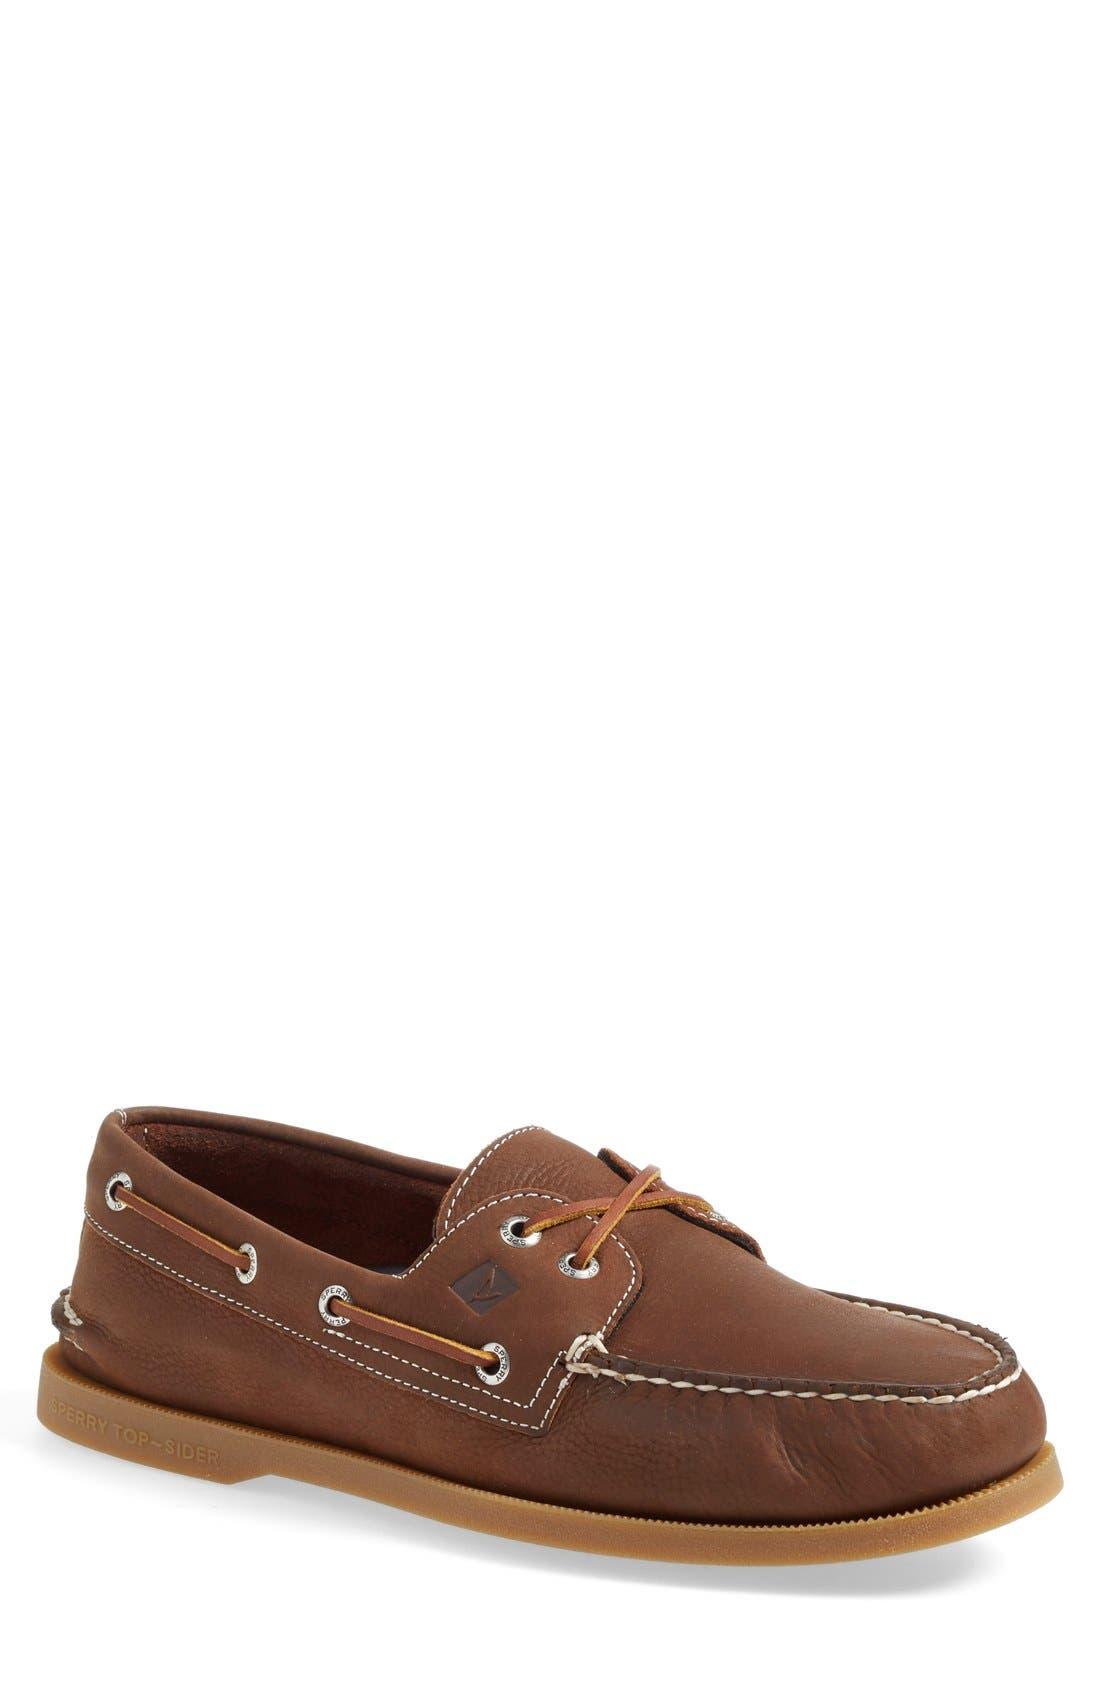 'Authentic Original' Boat Shoe,                         Main,                         color, Brown Leather